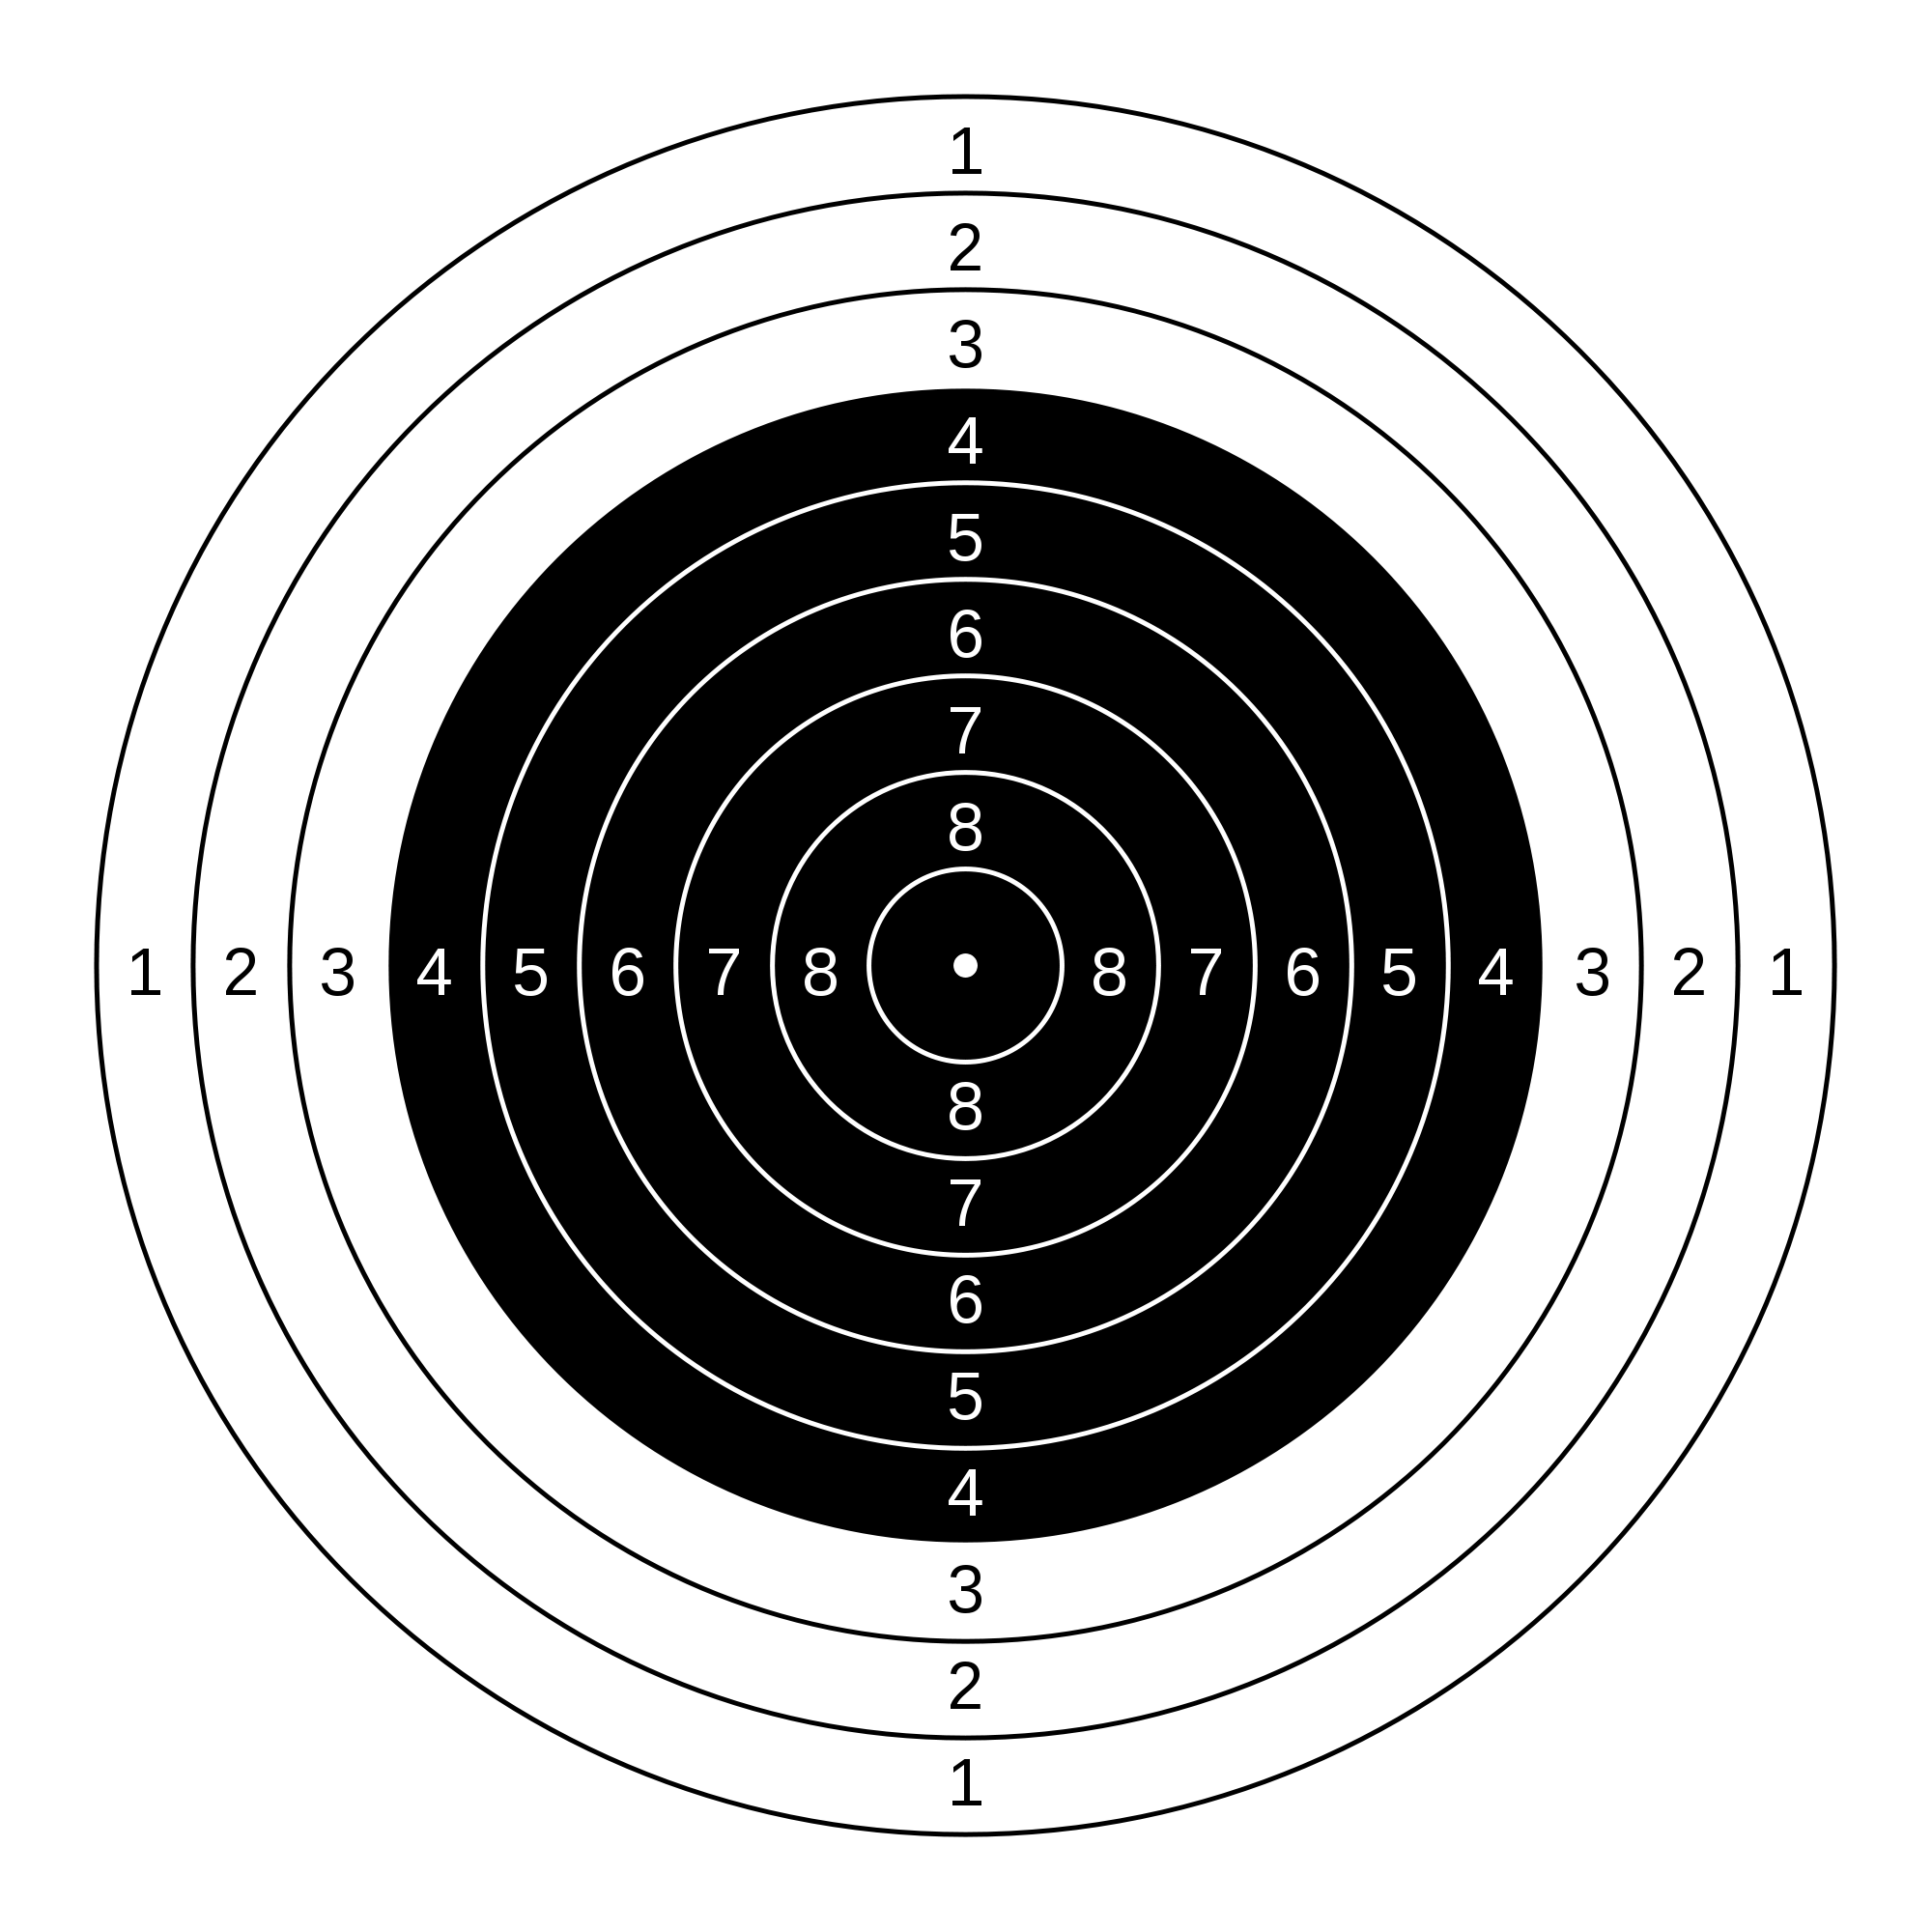 Target royalty free download File:10 m Air Rifle target.svg - Wikimedia Commons royalty free download